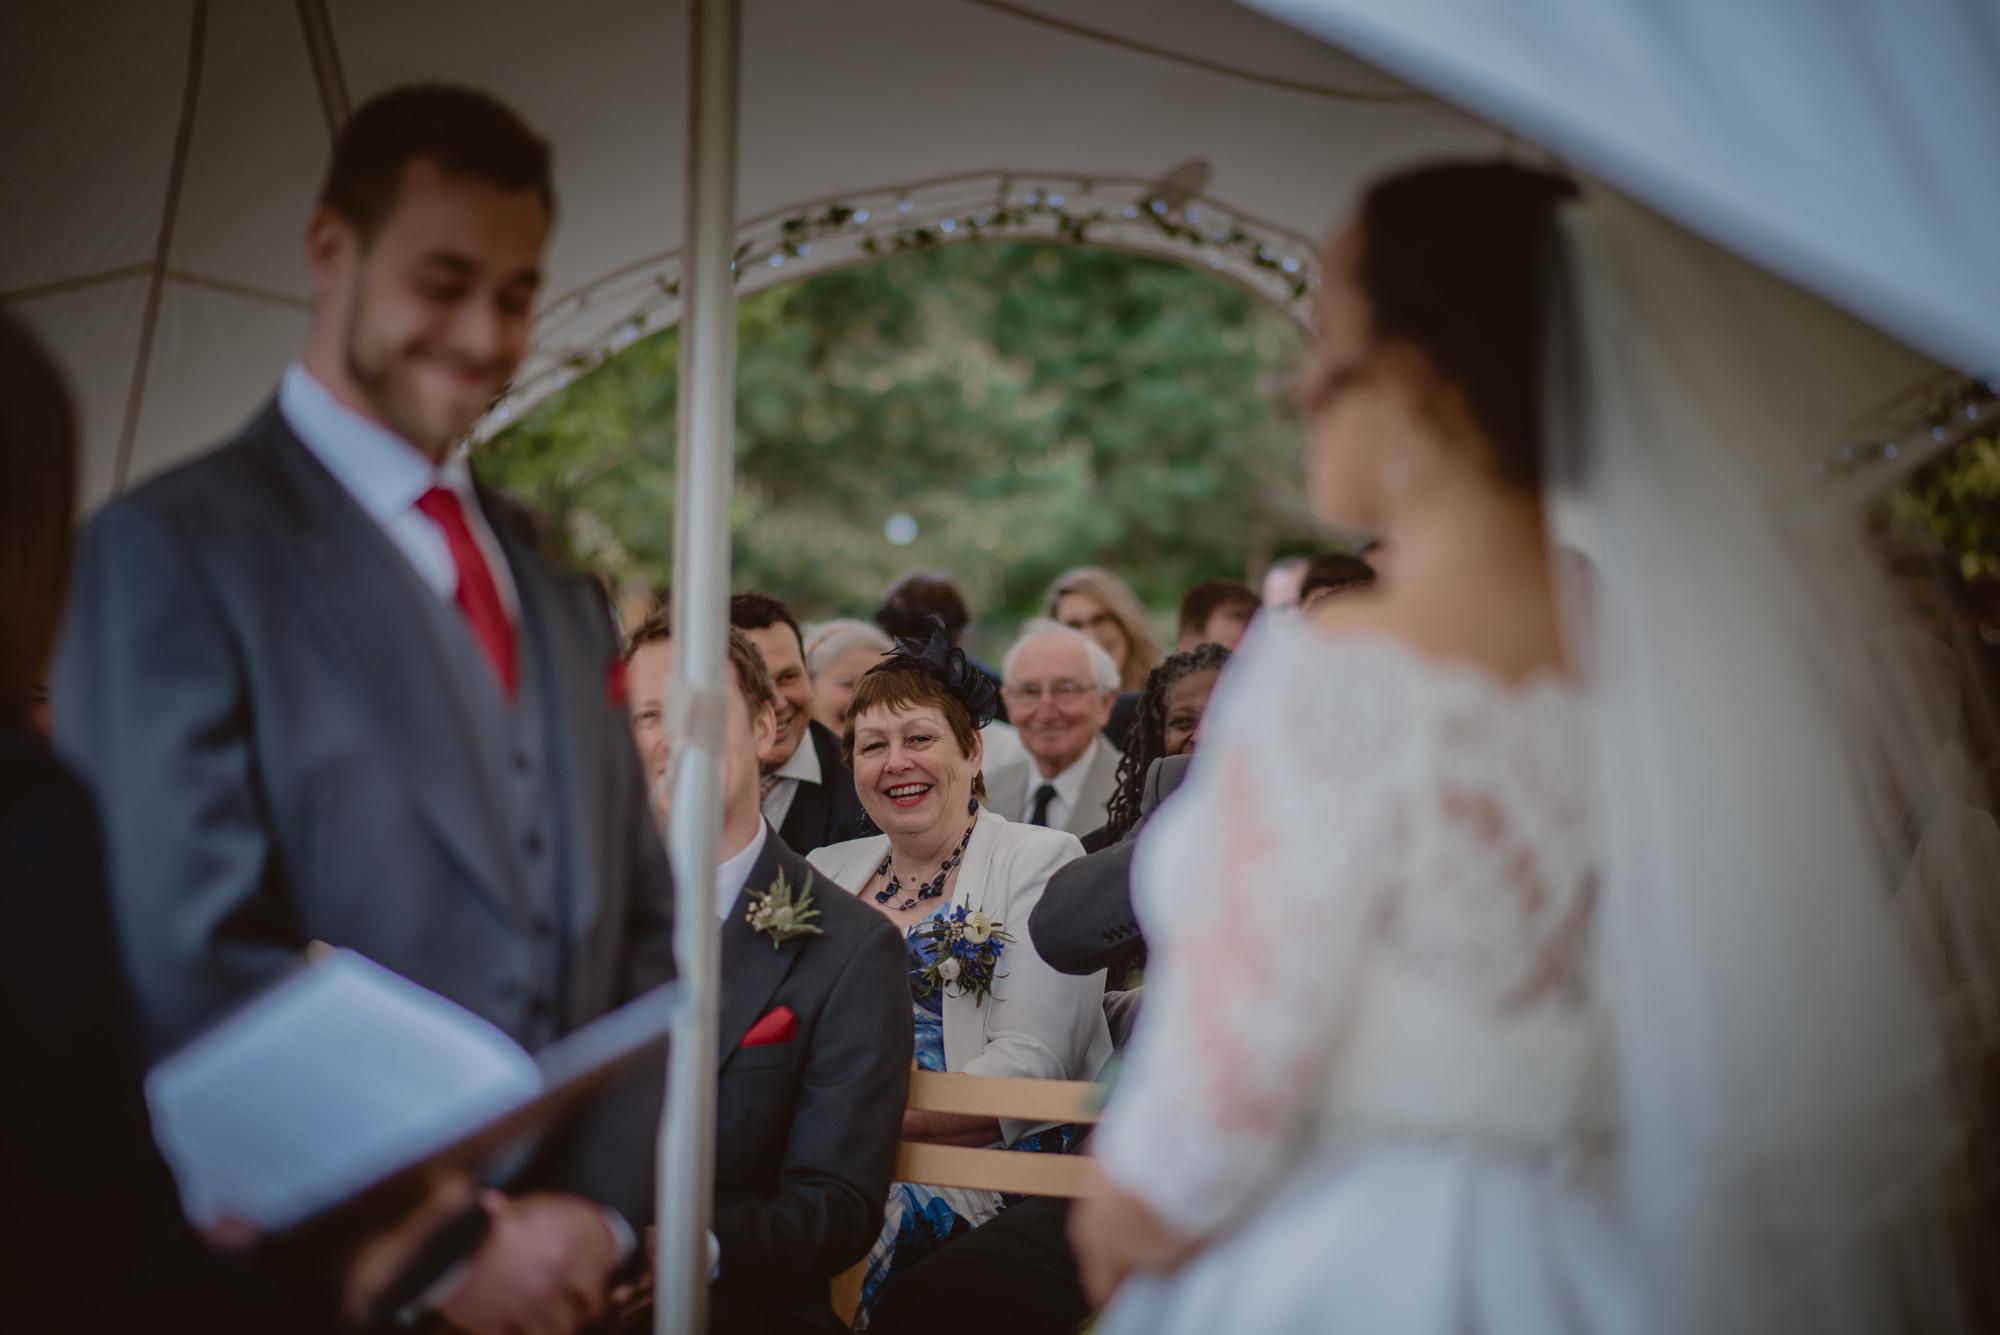 Jacqueline-Gareth-Wedding-Westmead-Events-Surrey-Manu-Mendoza-Wedding-Photography-231.jpg